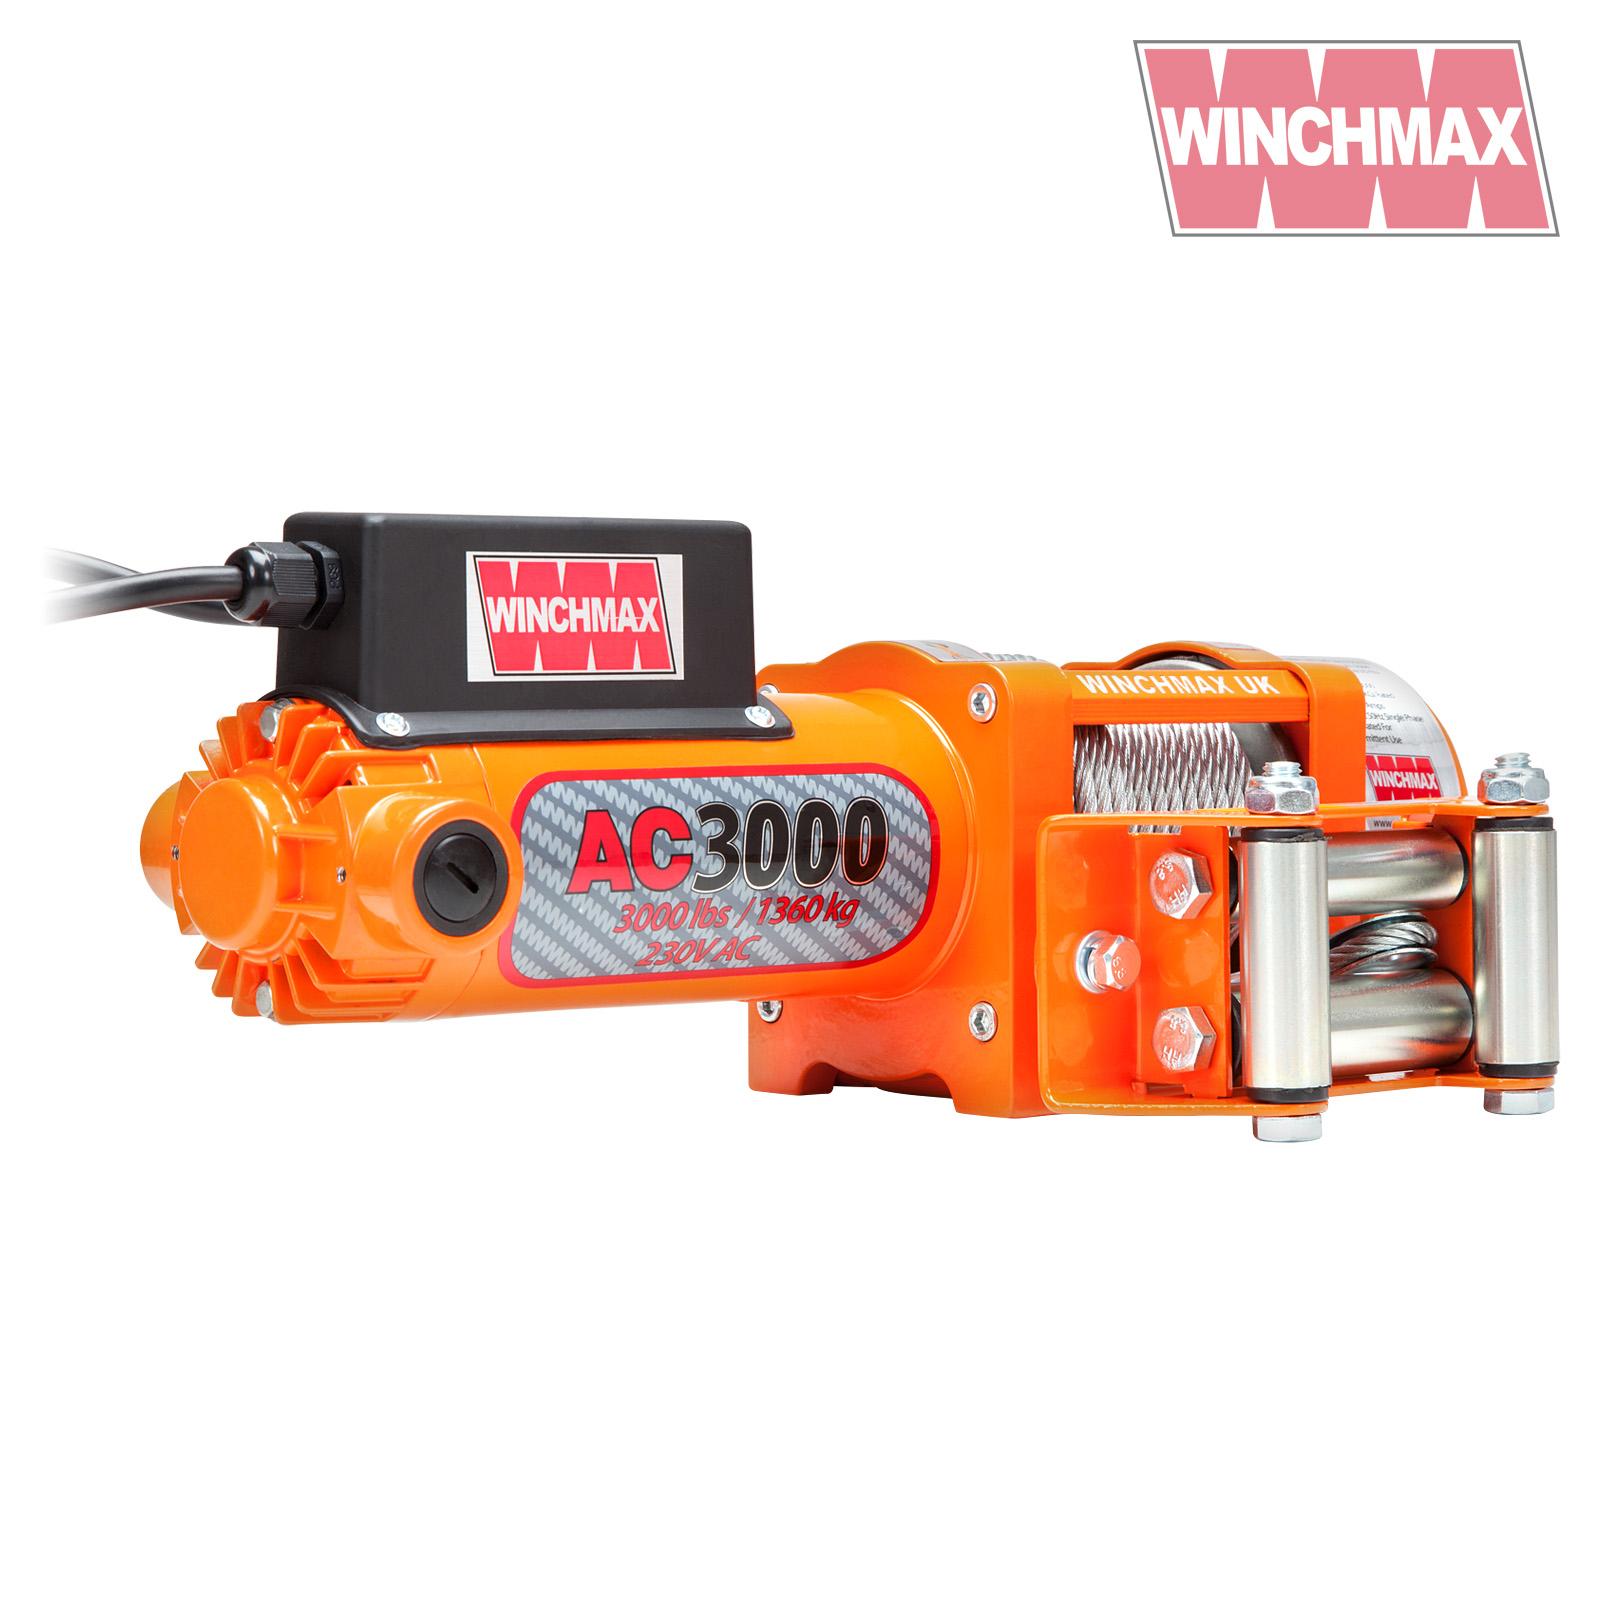 Wmac3000 winchmax 247